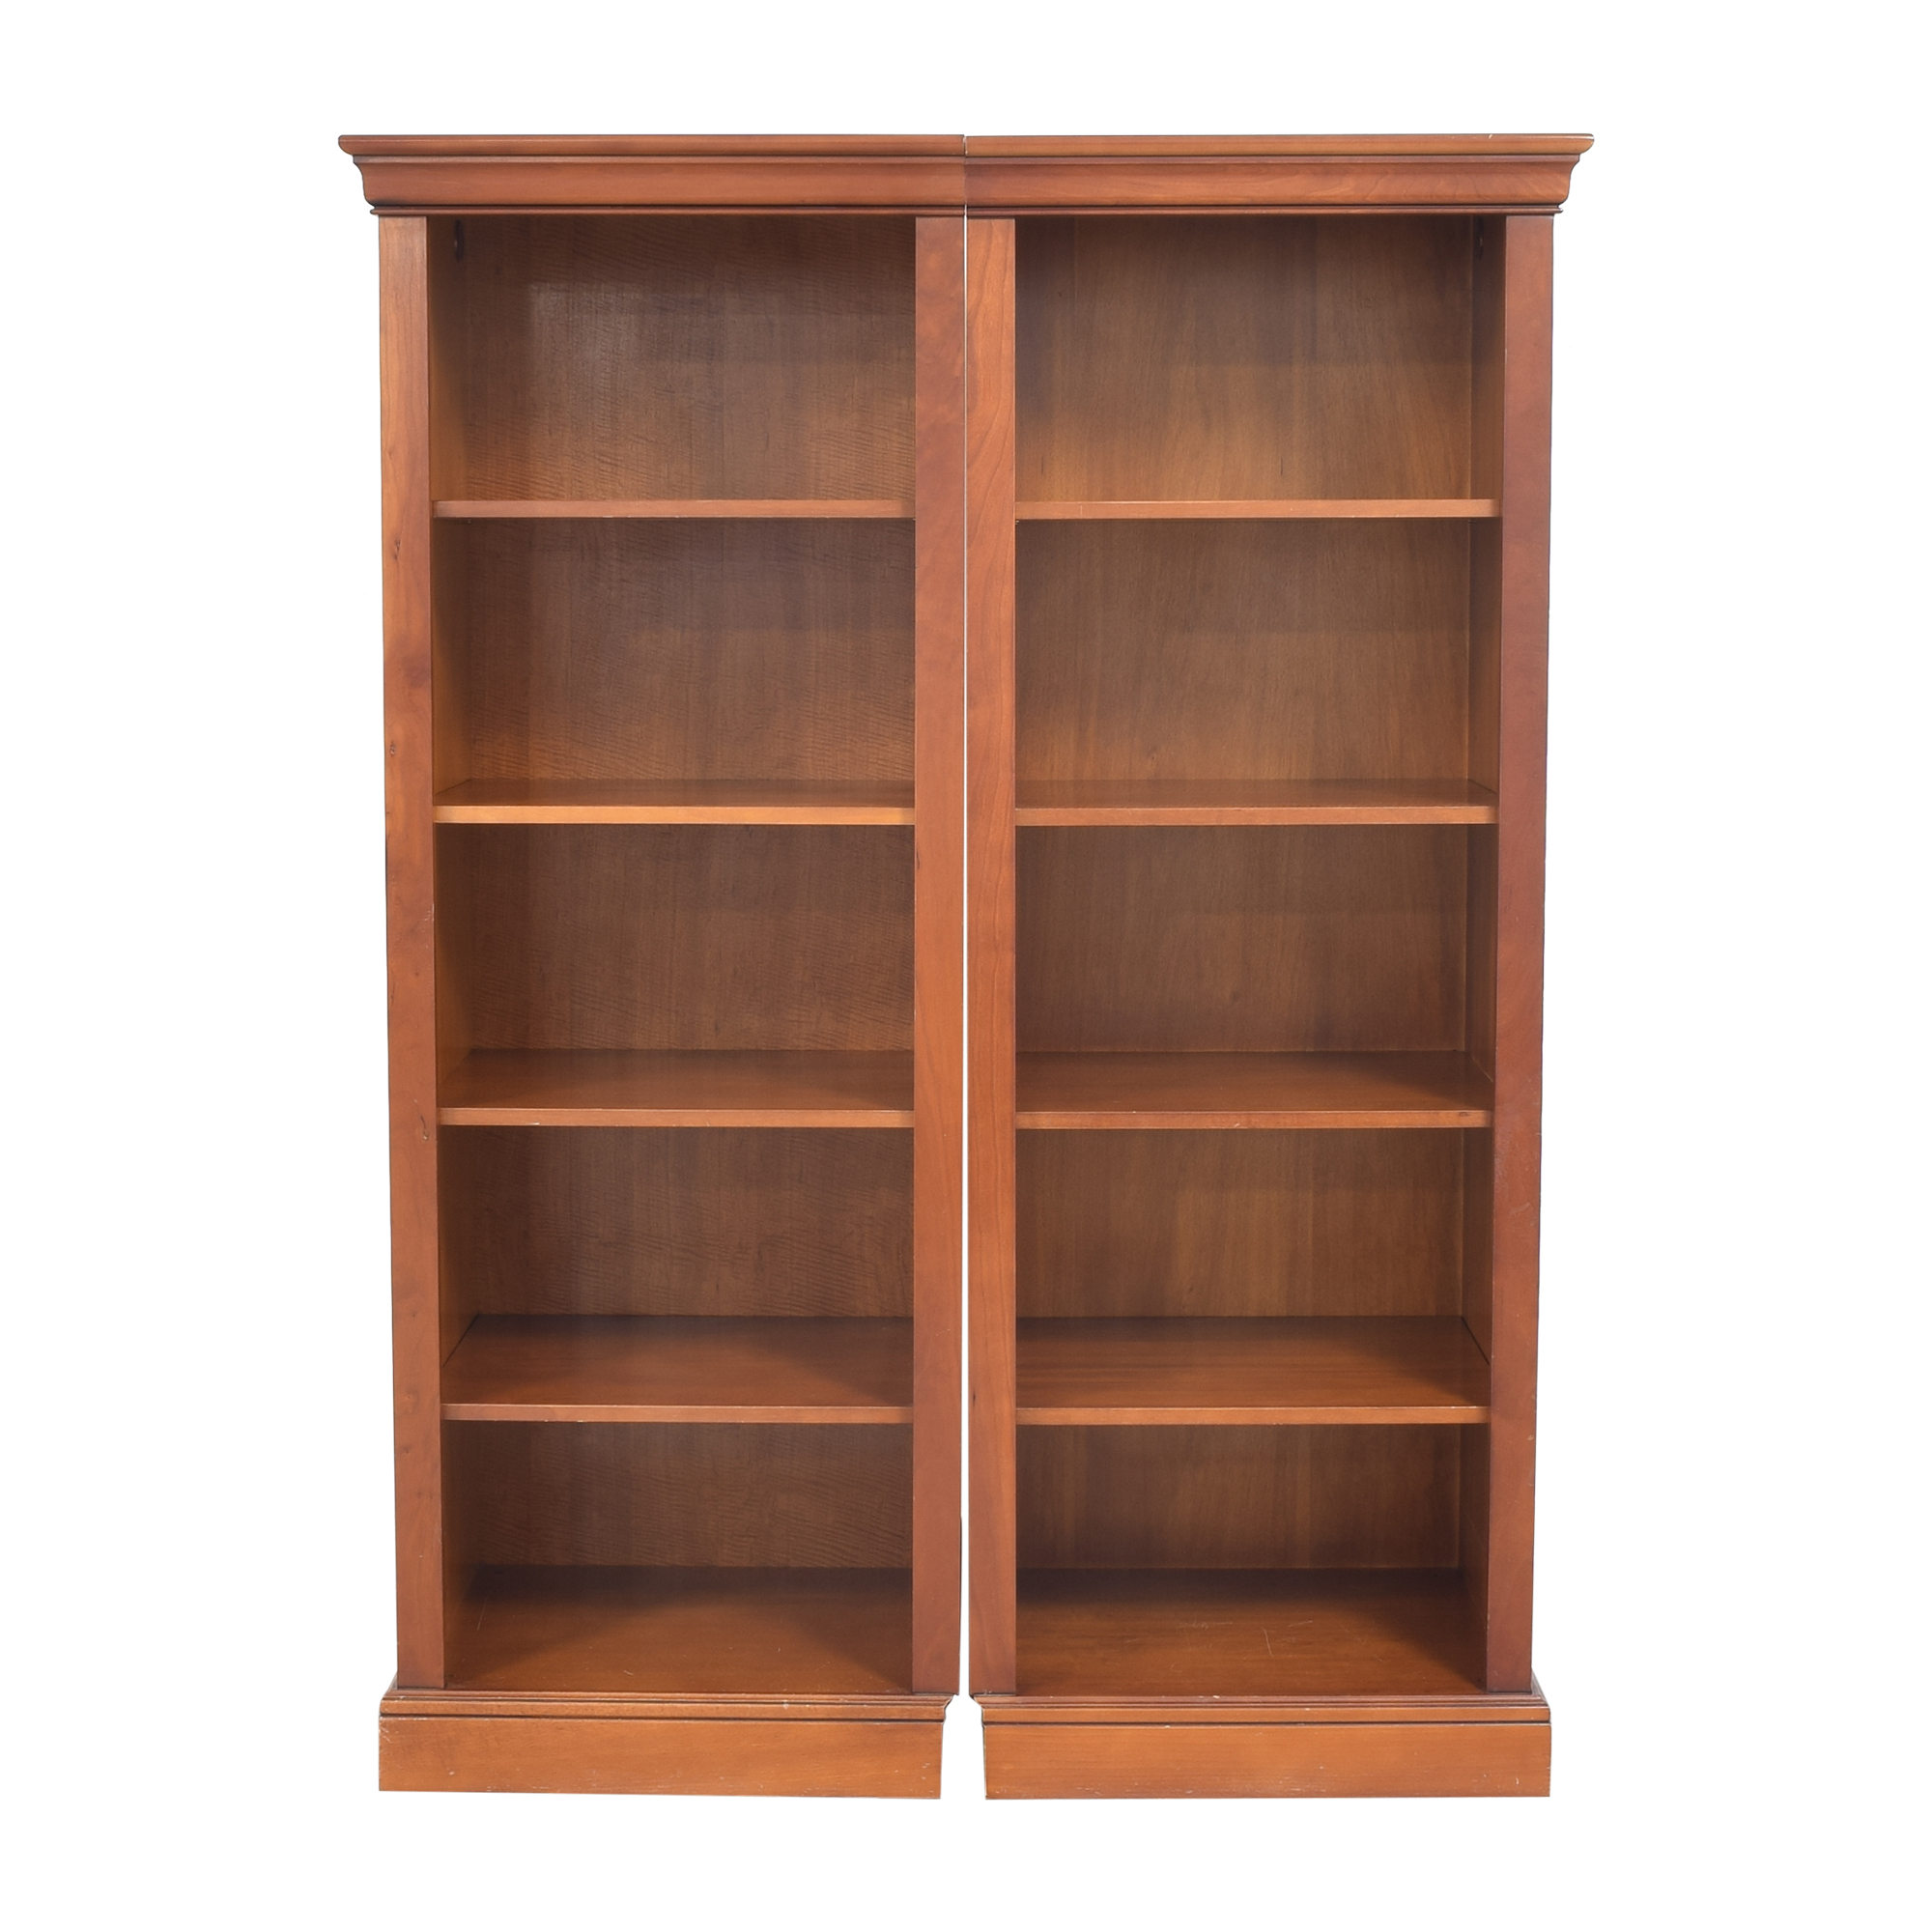 Grange Grange Tall Bookcases Bookcases & Shelving